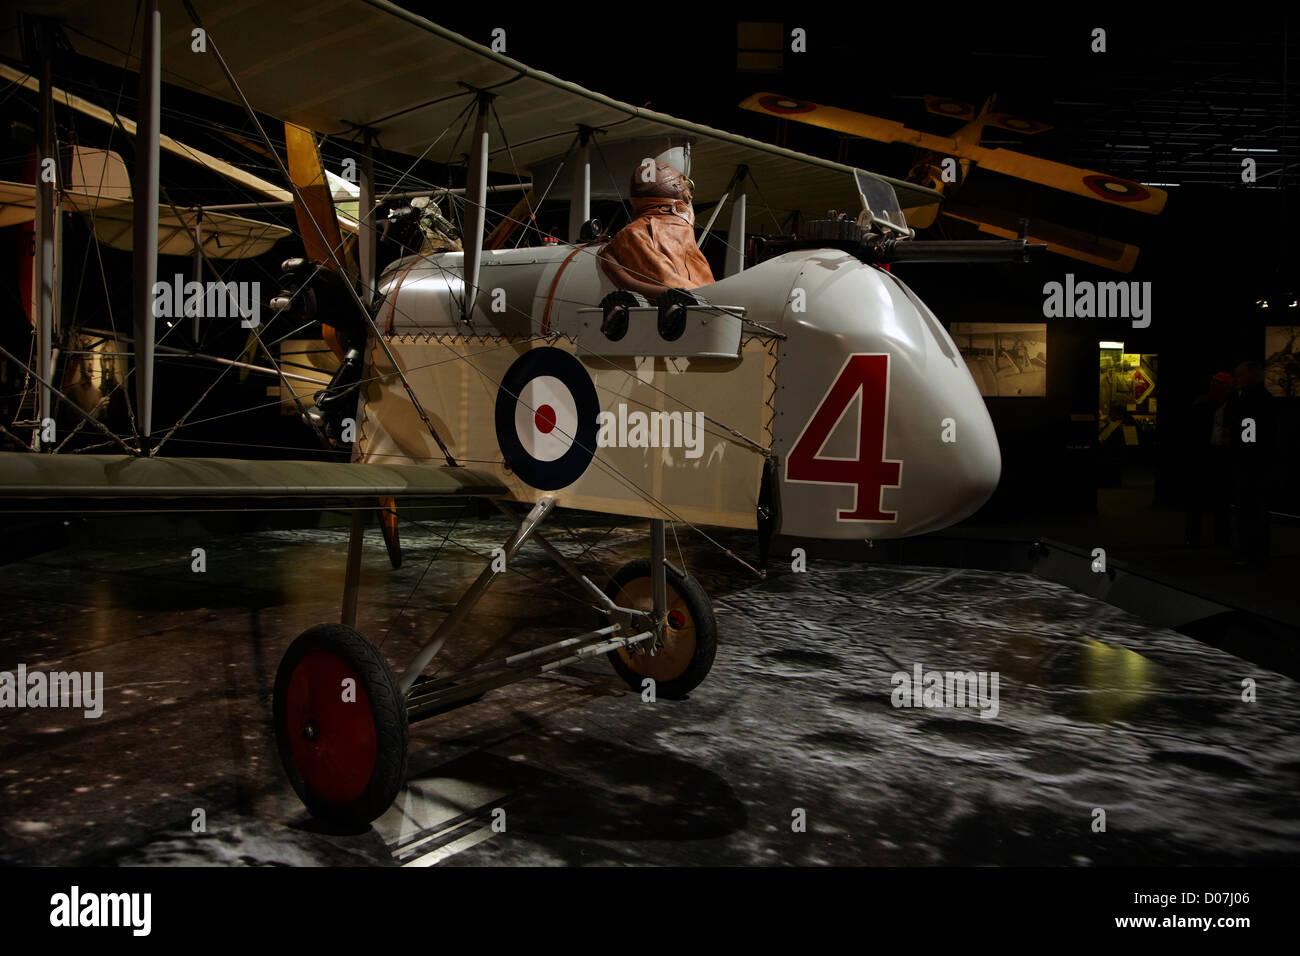 Airco DH-2 biplane, Omaka Aviation Heritage Centre, Blenheim, Marlborough, South Island, New Zealand - Stock Image